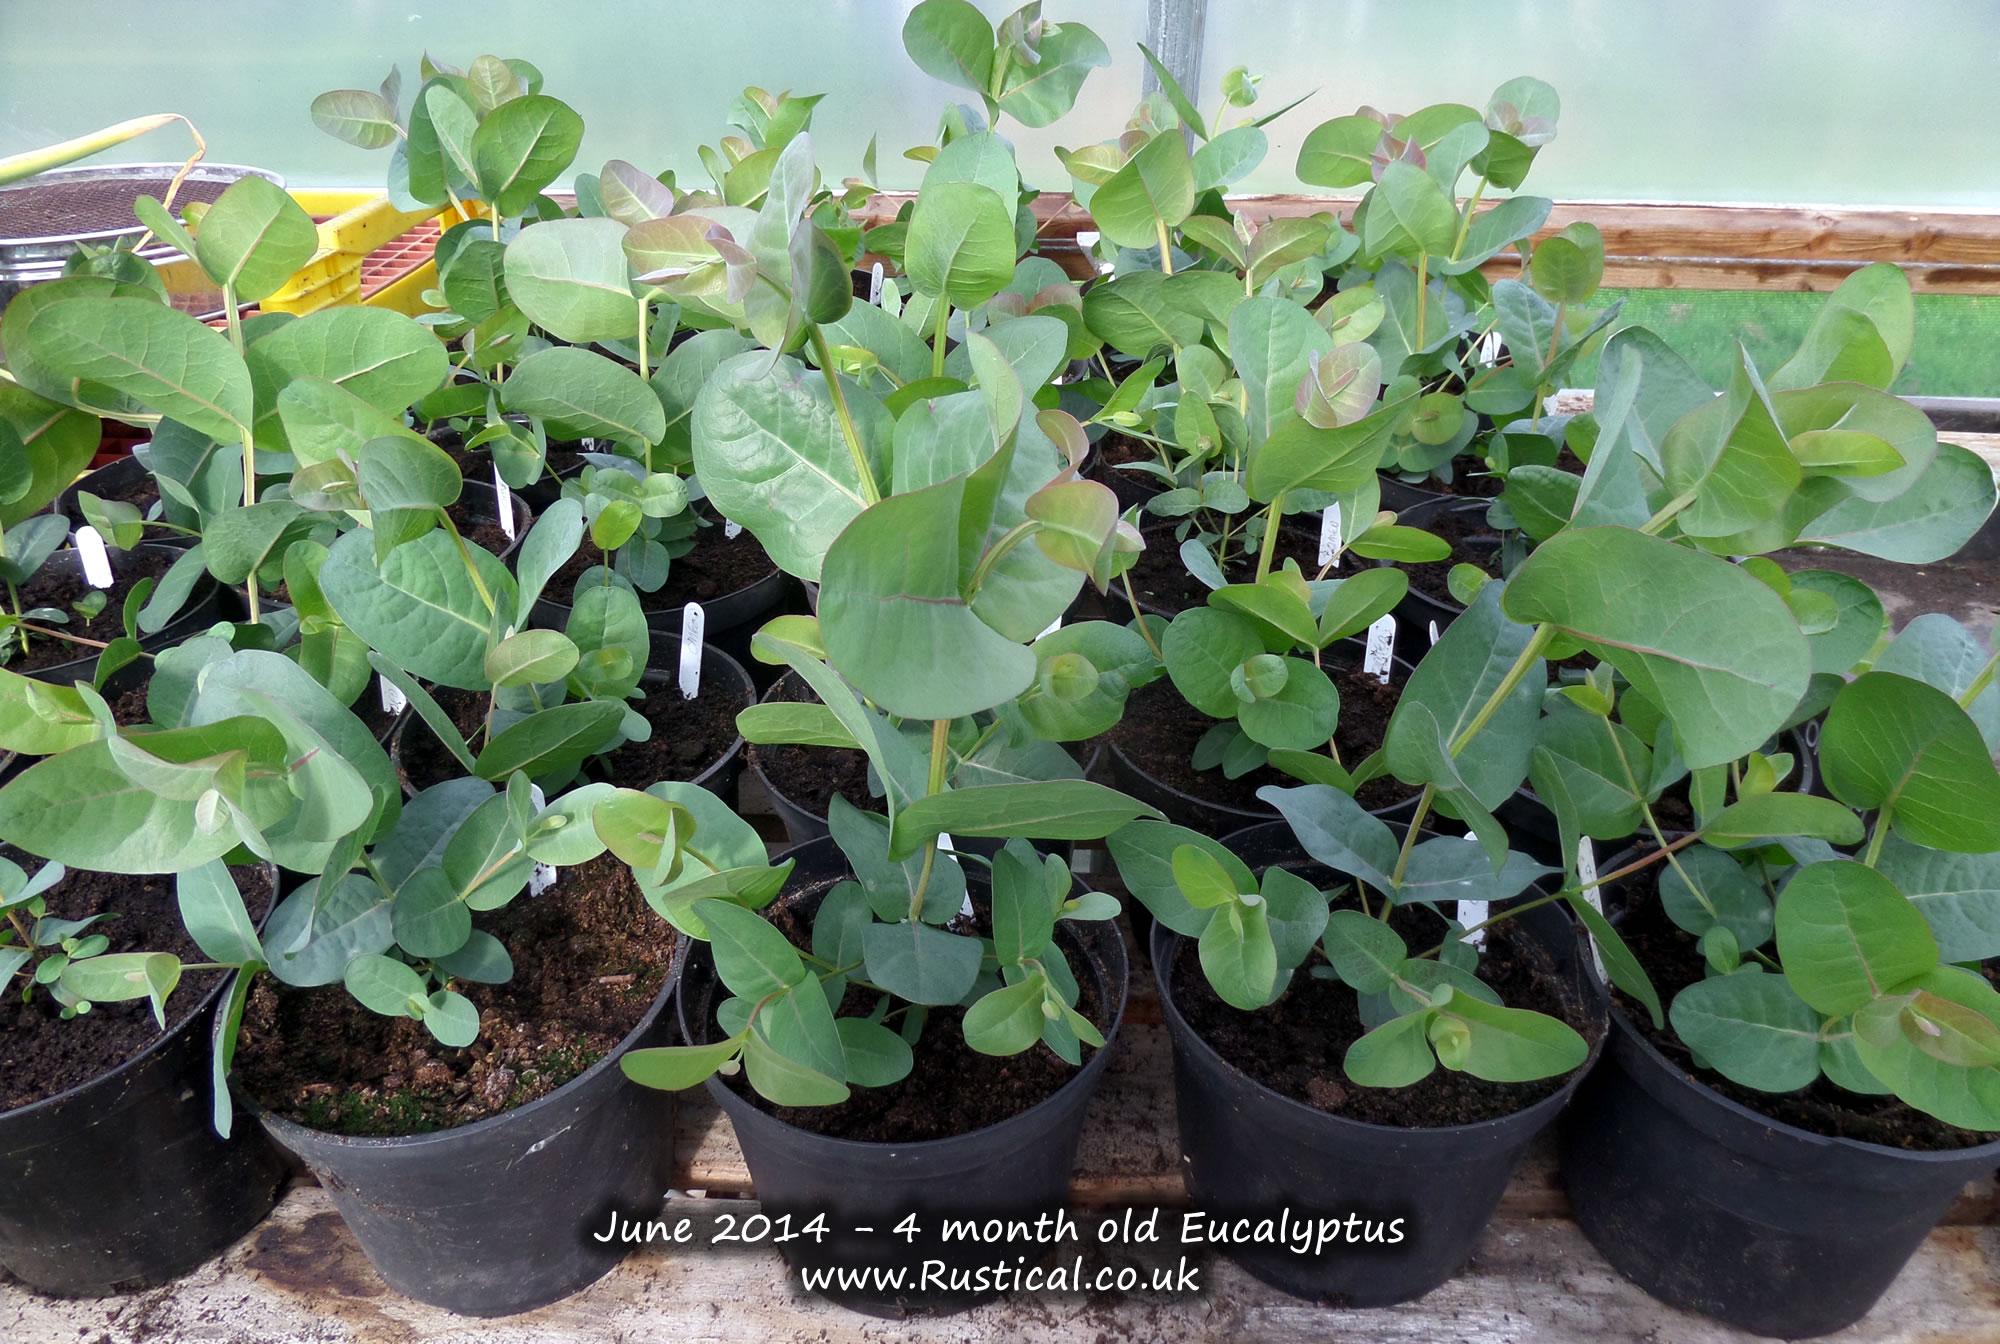 4 month old Eucalyptus (June 2014)